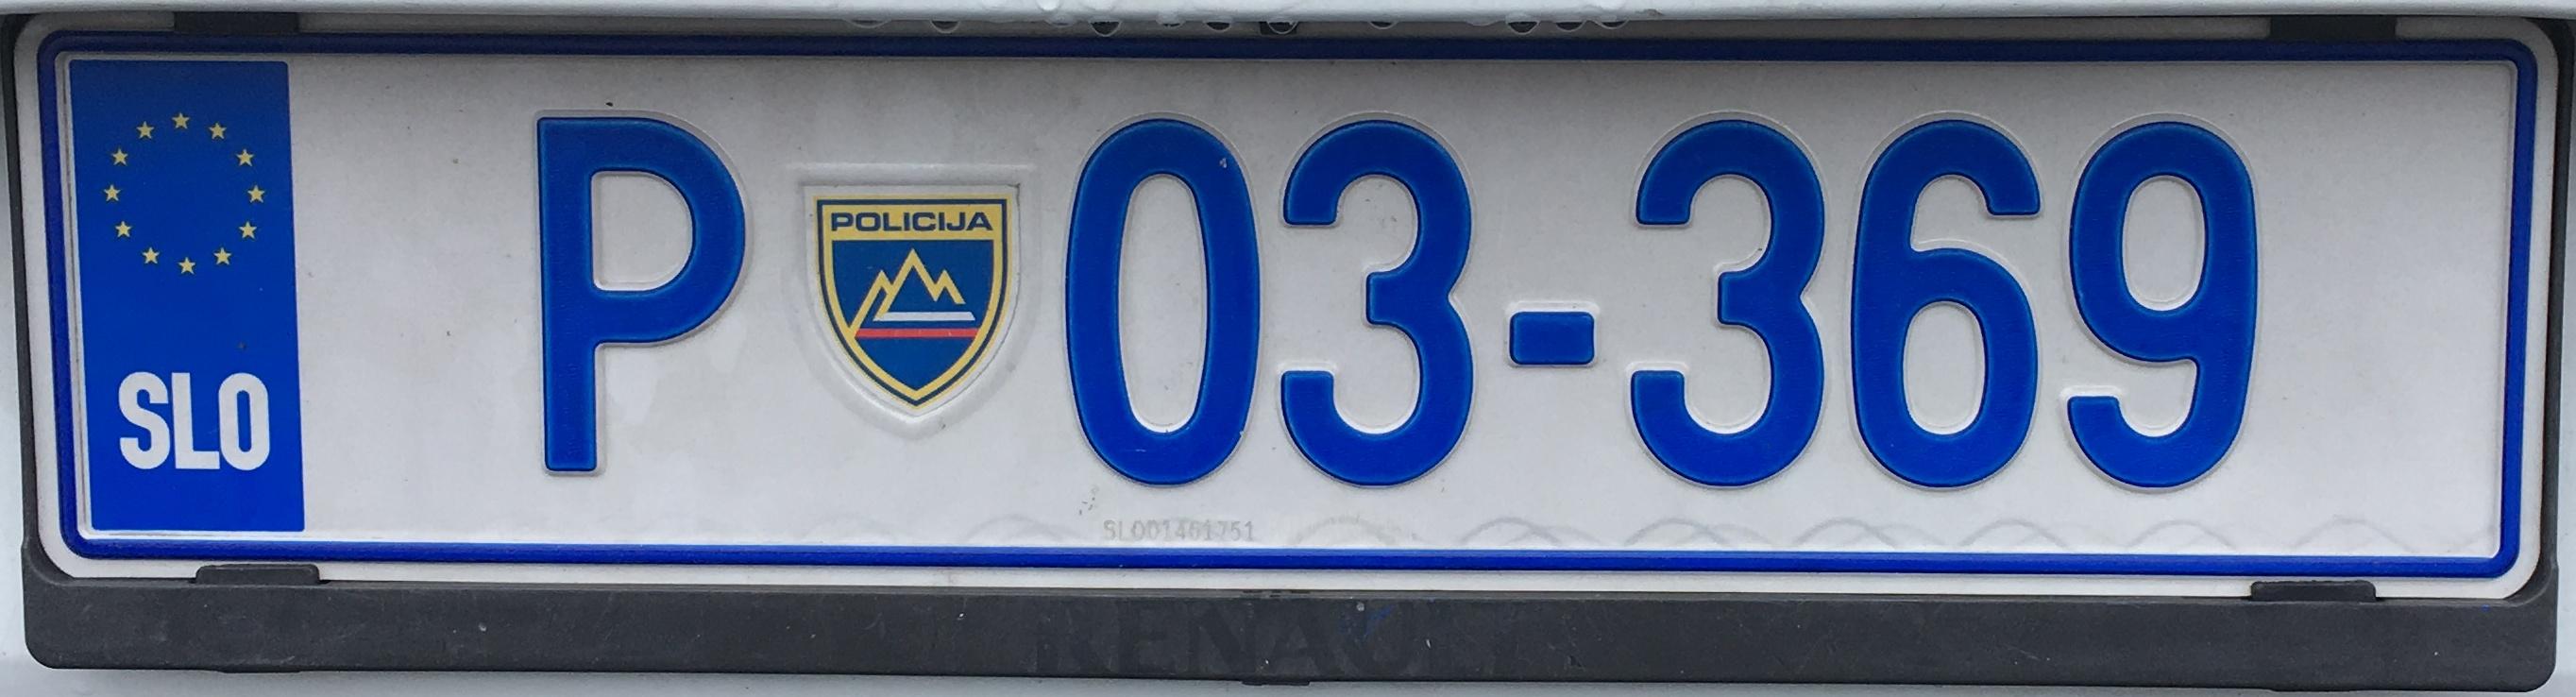 Registrační značka Slovinsko - policie, foto: www.podalnici.cz